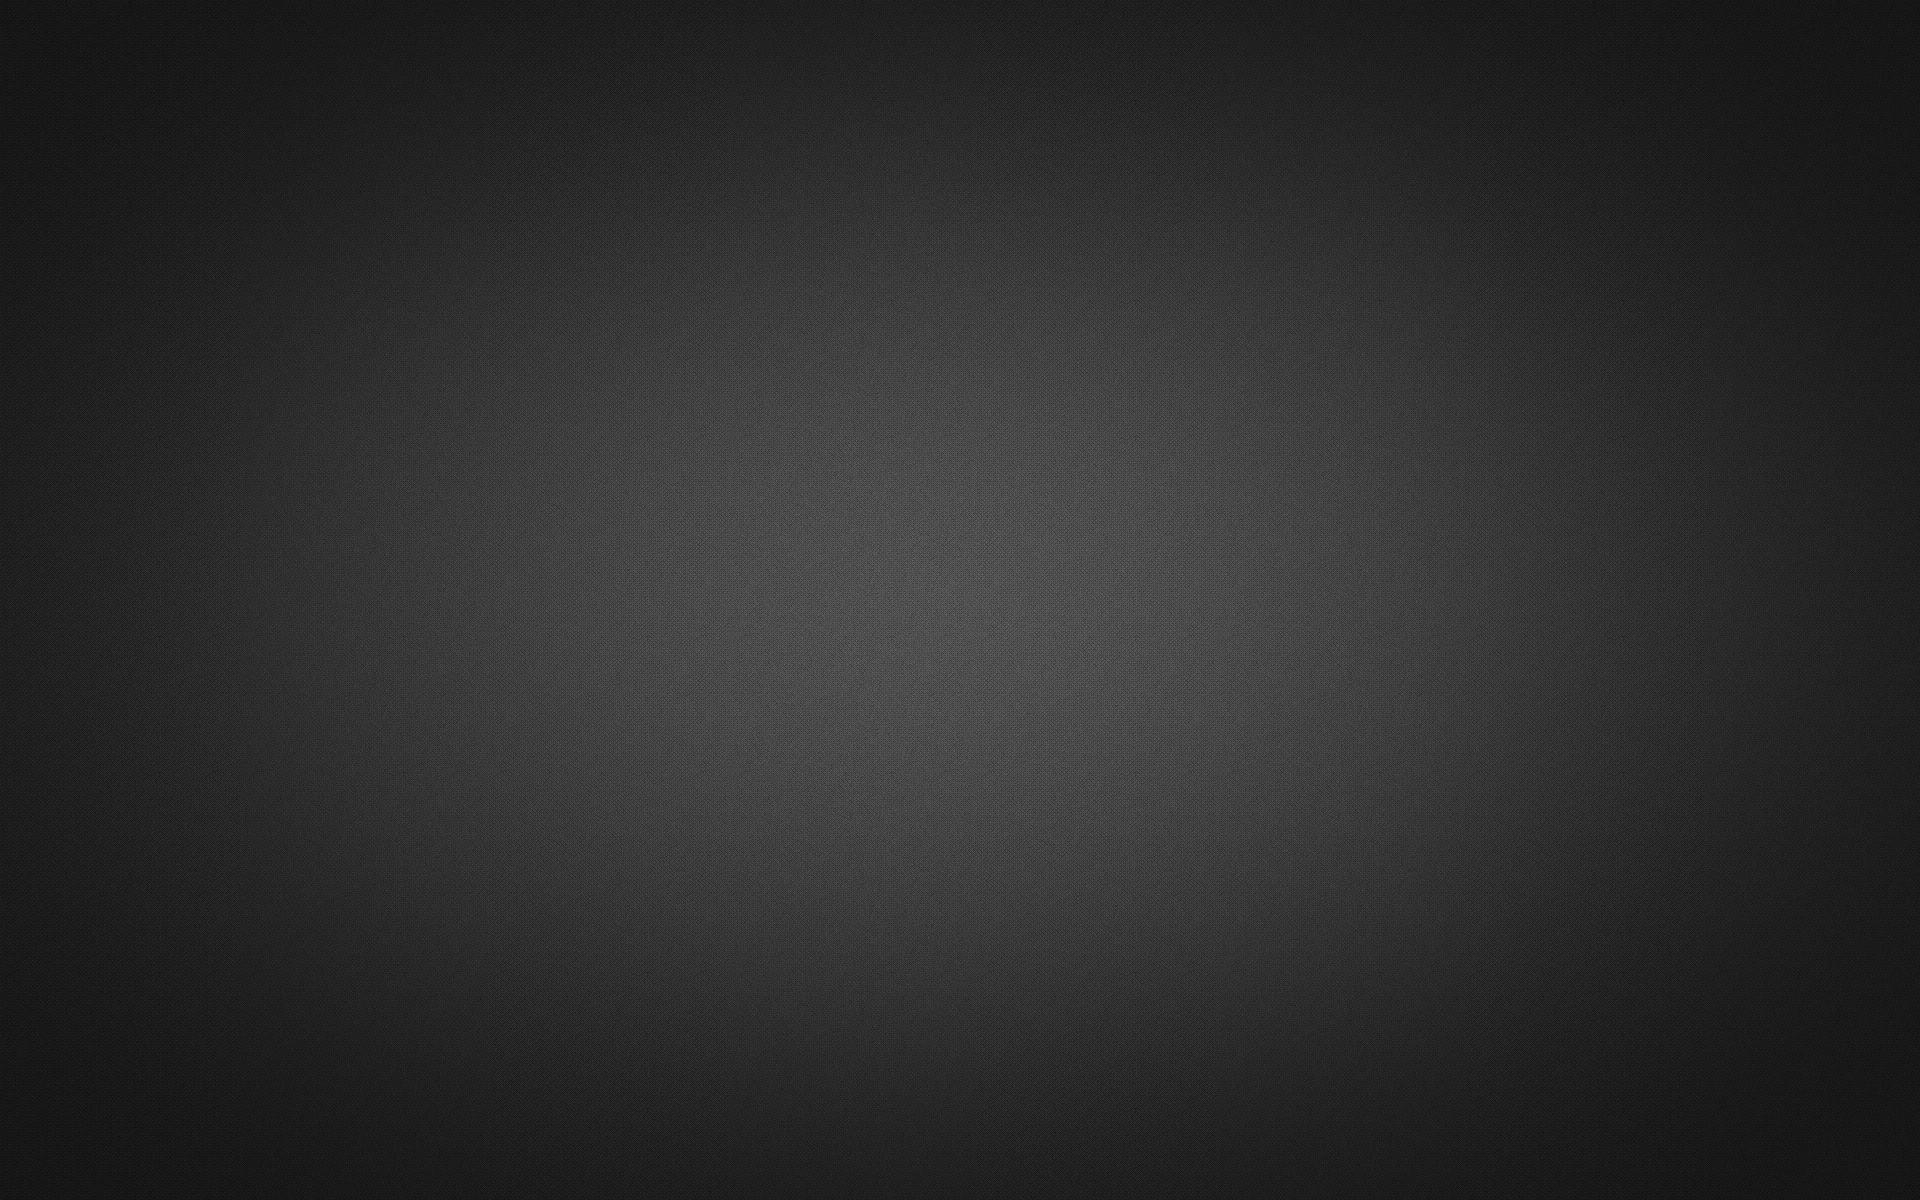 720x1280 Wallpaper Hd Black Dark Grey Background 183 ① Download Free Amazing Backgrounds